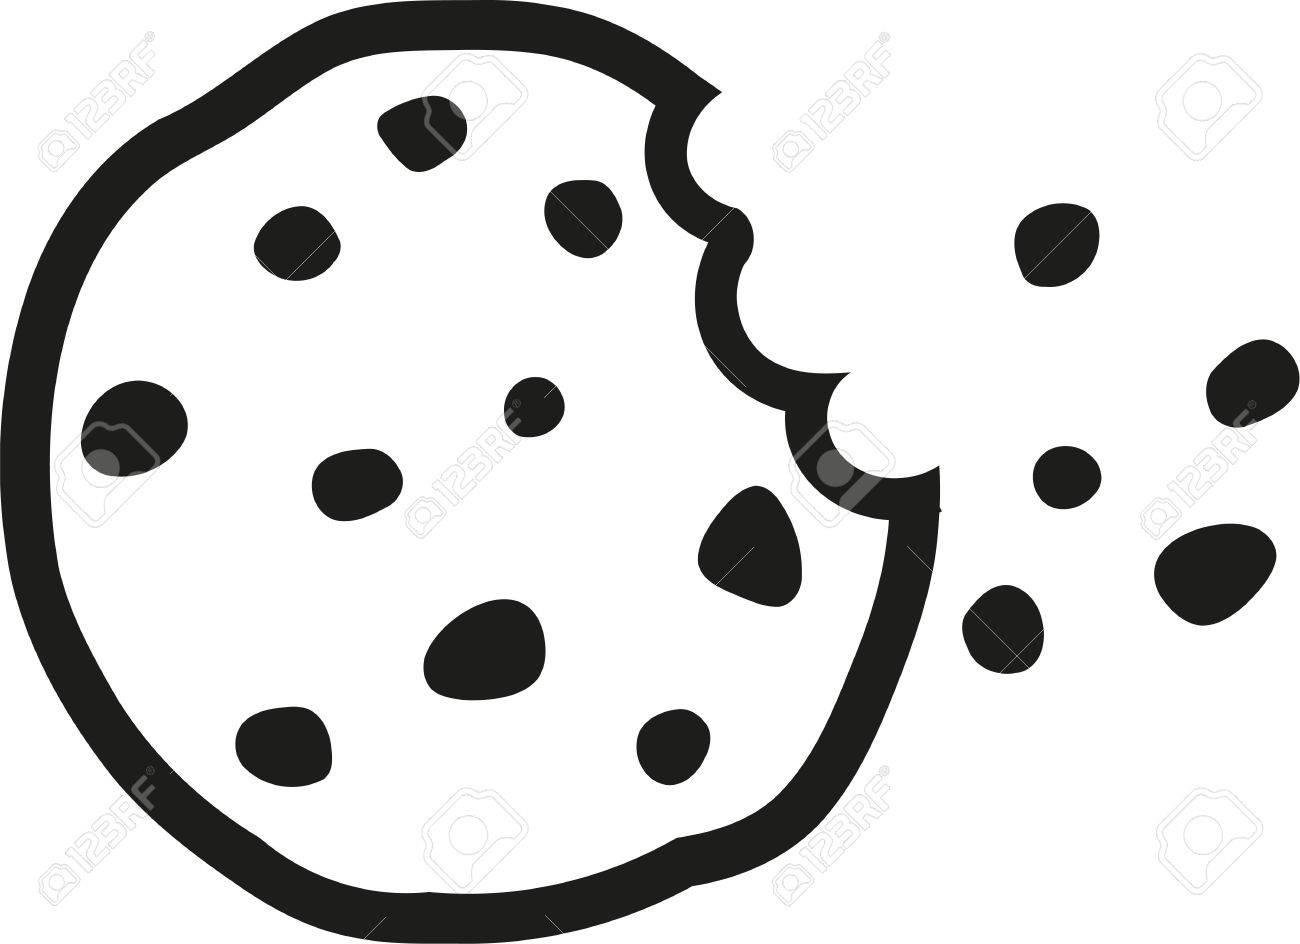 Chocolate chip cookie a bite taken - 59635934